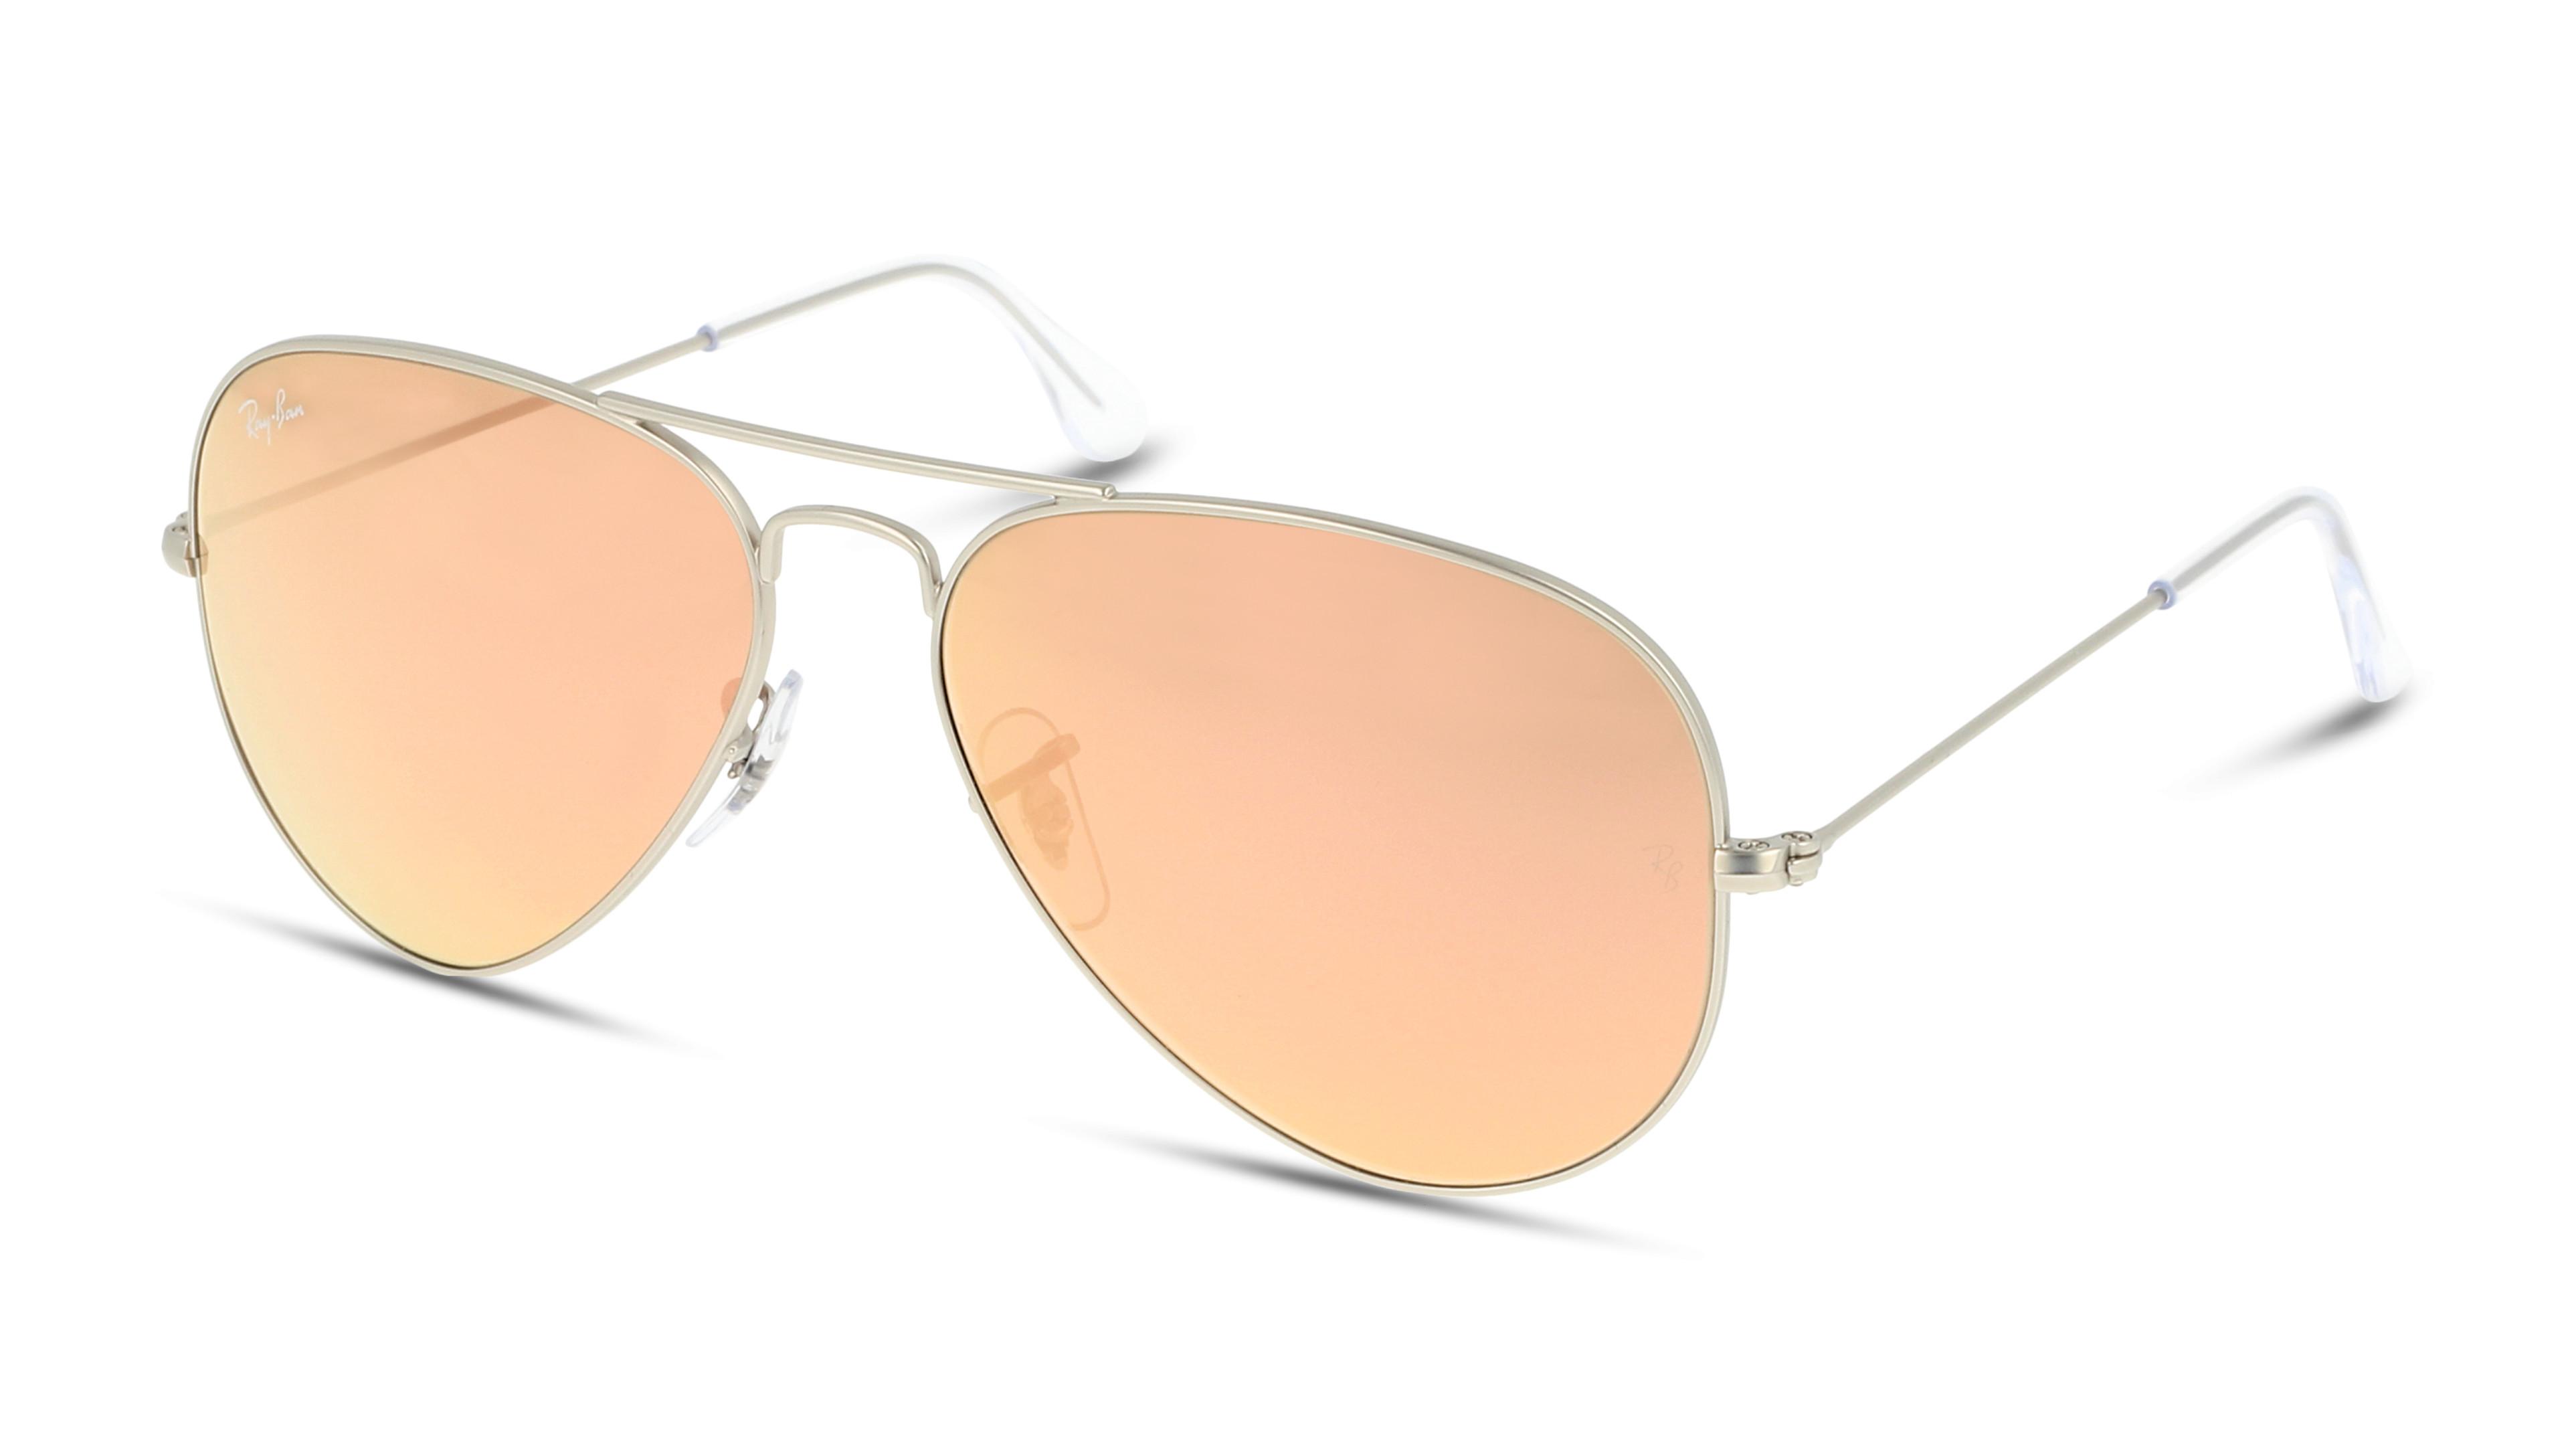 8053672158656-angle-01-rayban-glasses-eyewear-pair